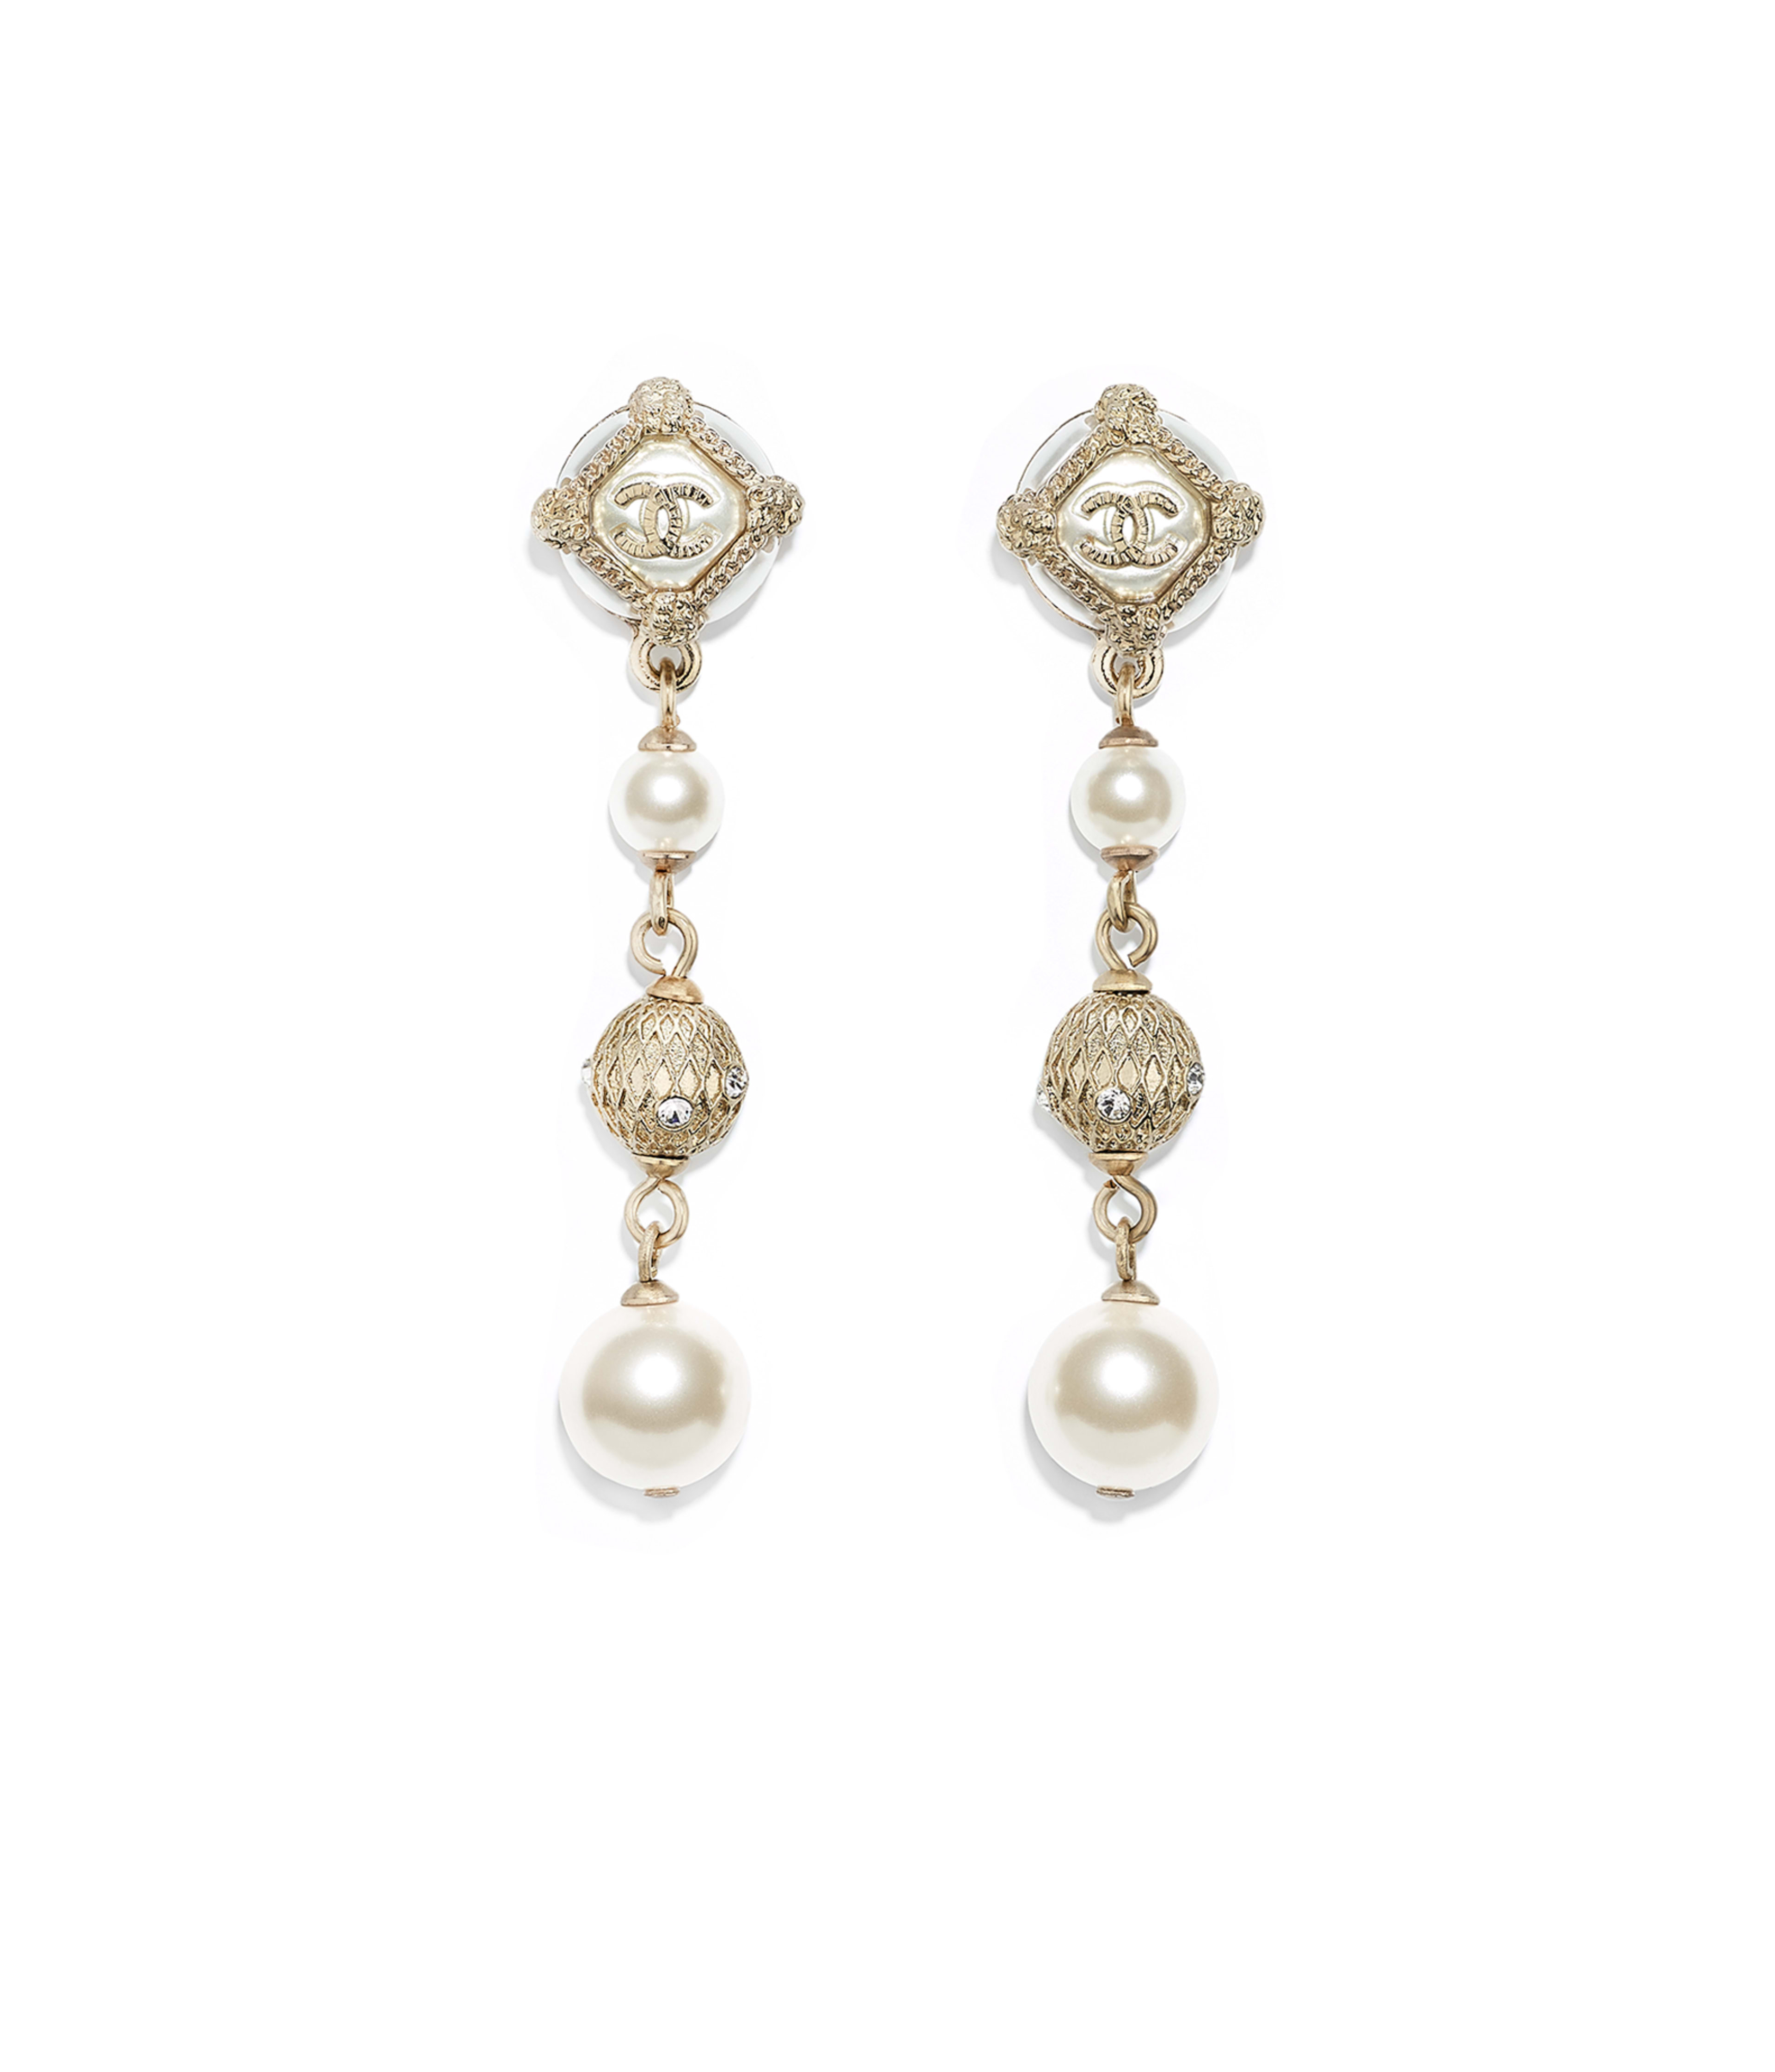 Earrings Metal Gl Pearls Str Resin Gold Pearly White Crystal Ref Ab0678y47467z8887